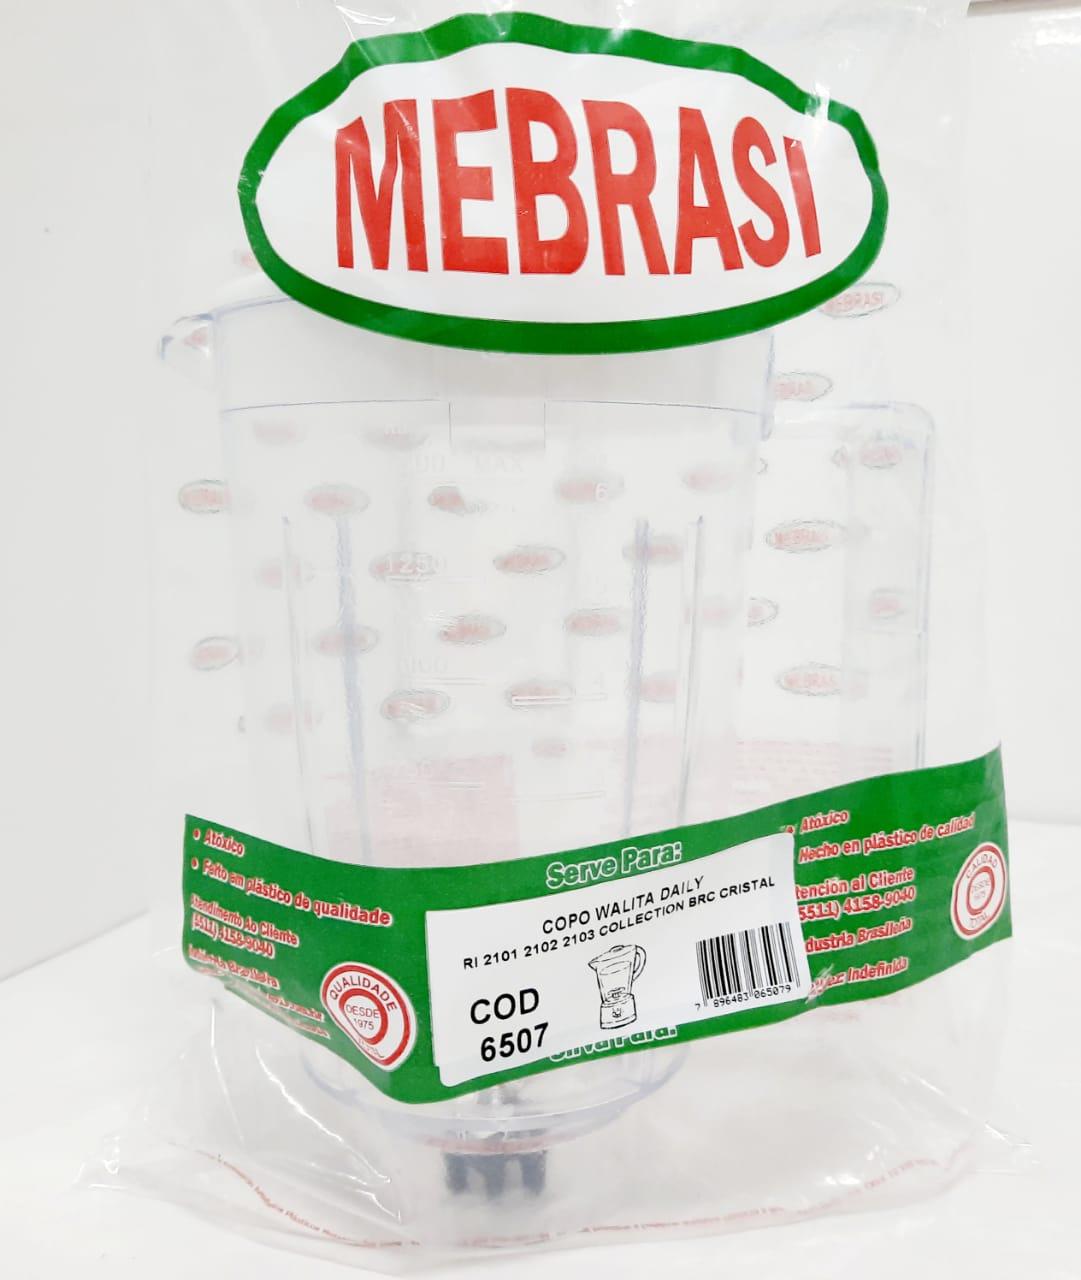 Copo WAL CRS DAILY RI2101/2/3 TB - Mebrasi